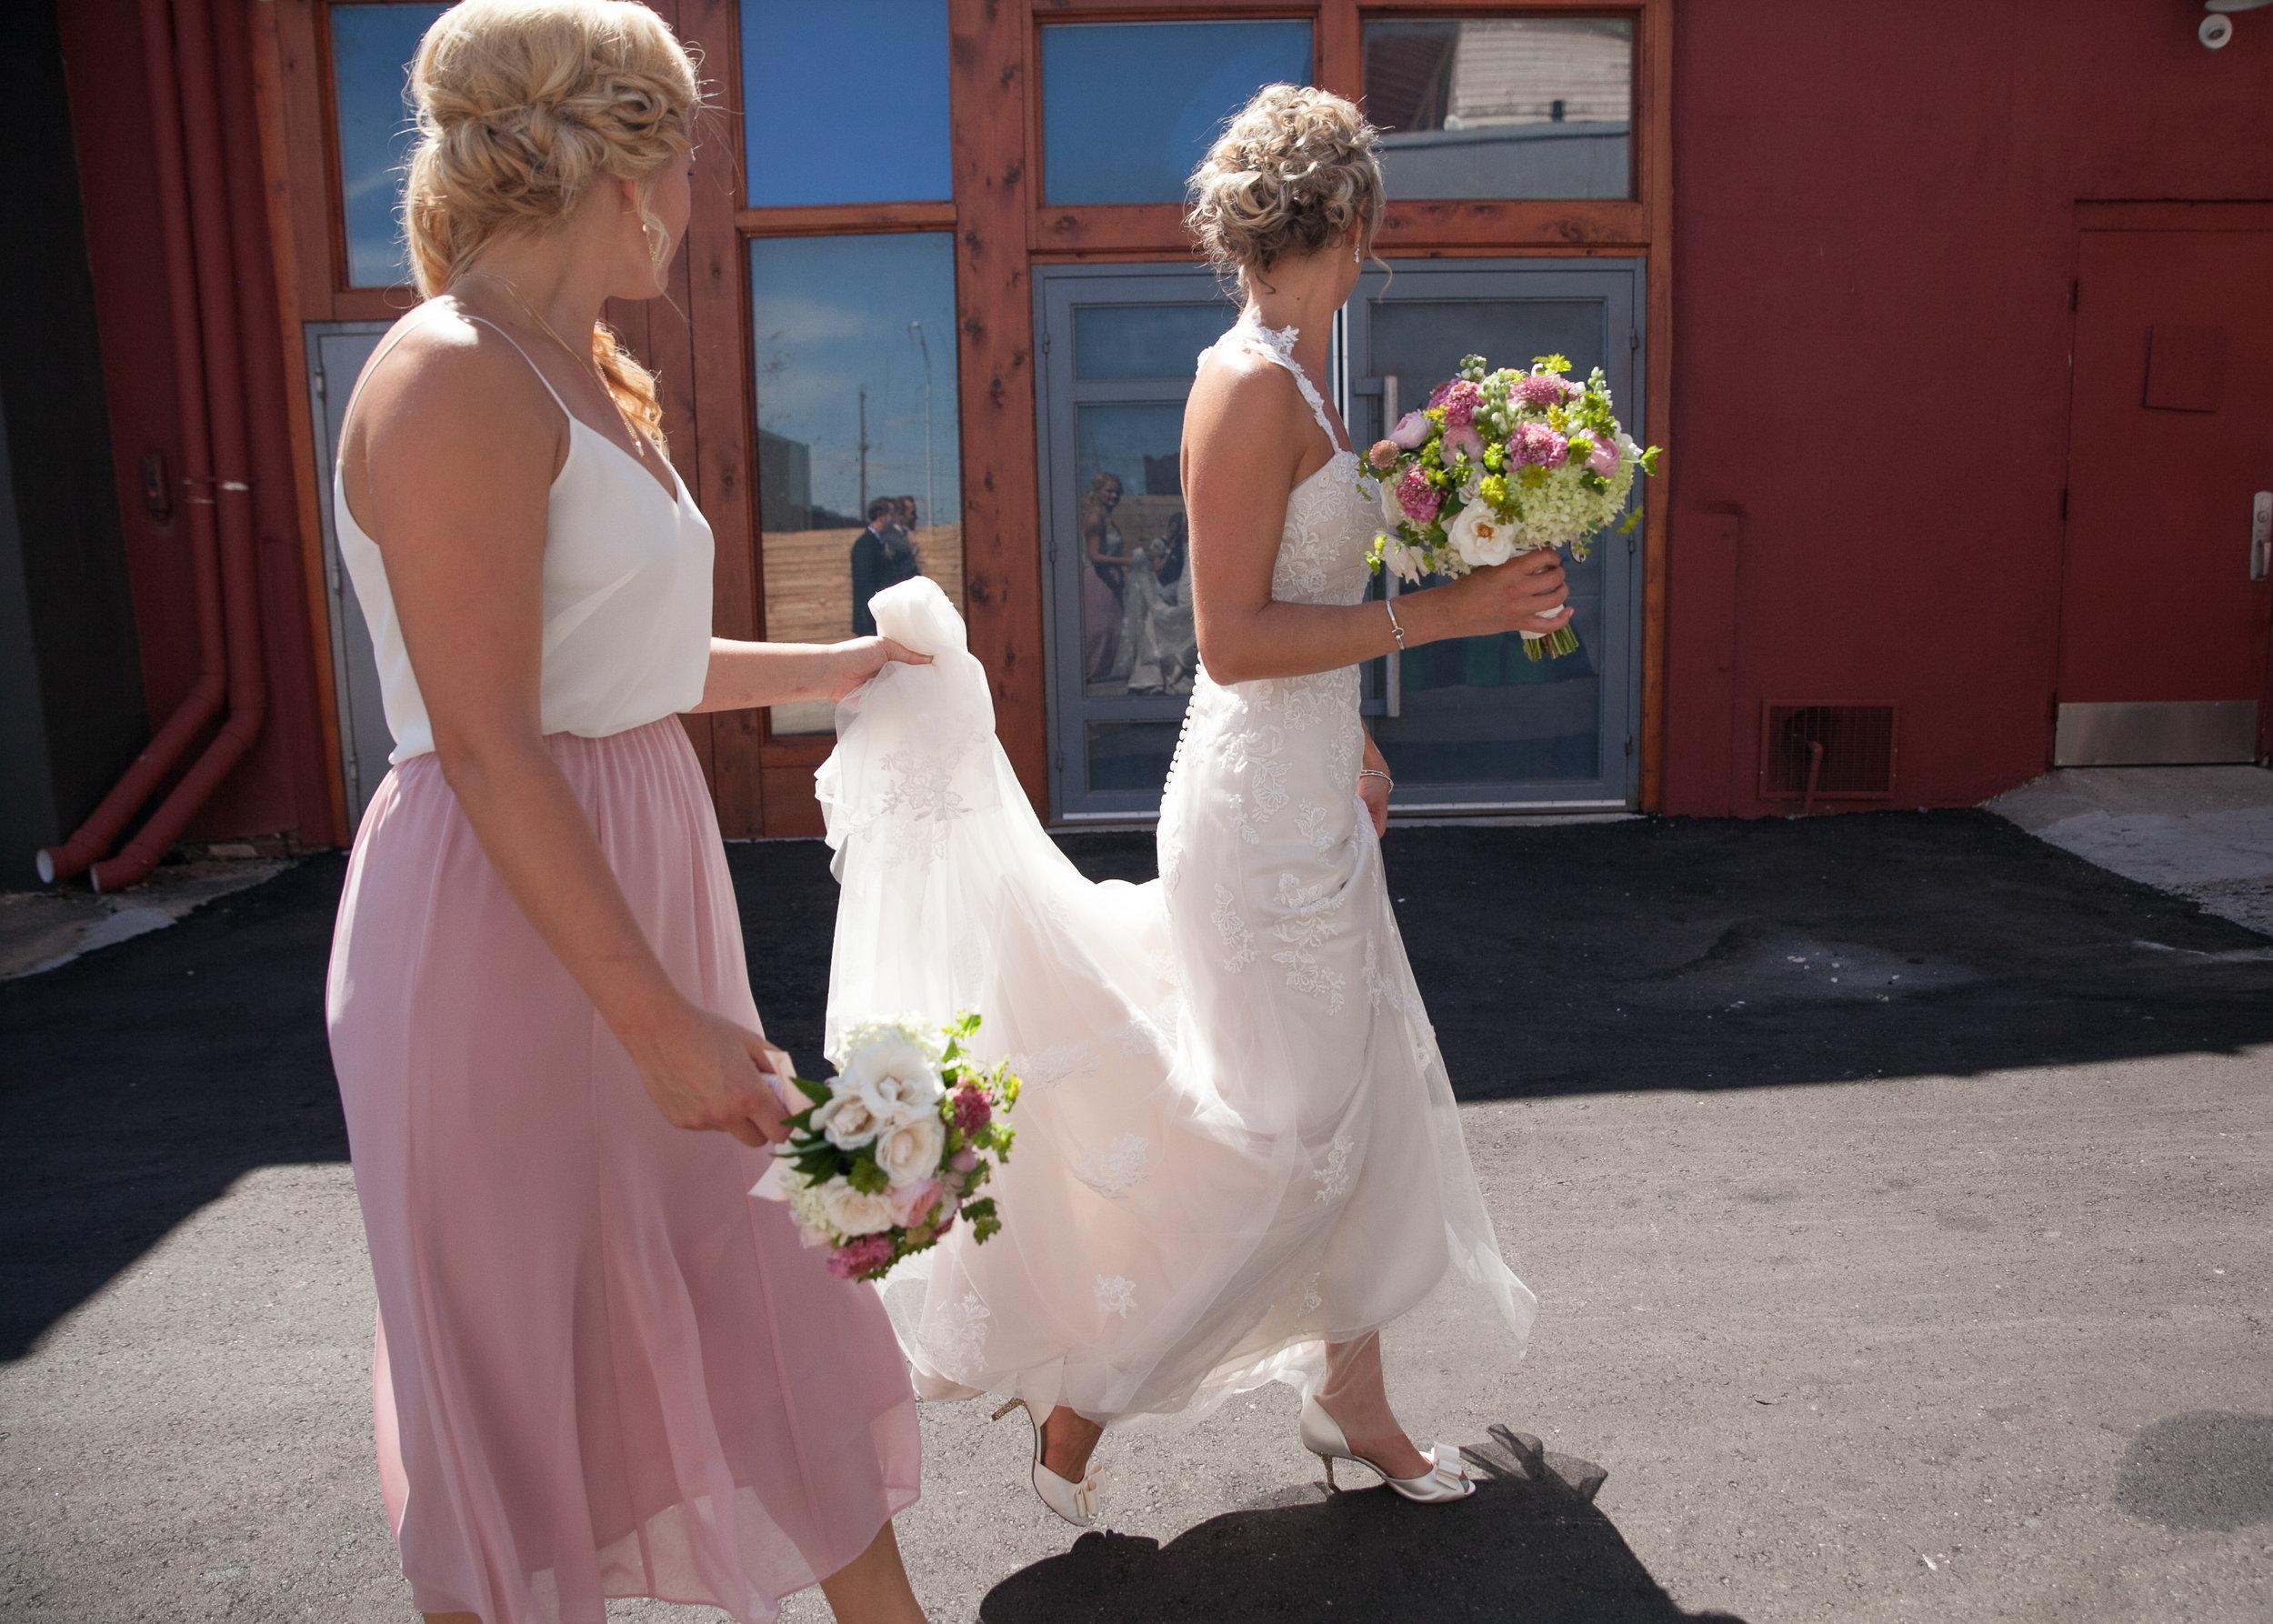 Kansas+City_Small+Wedding_Elope_Intimate_Ceremony_Best+Friends_6.jpg